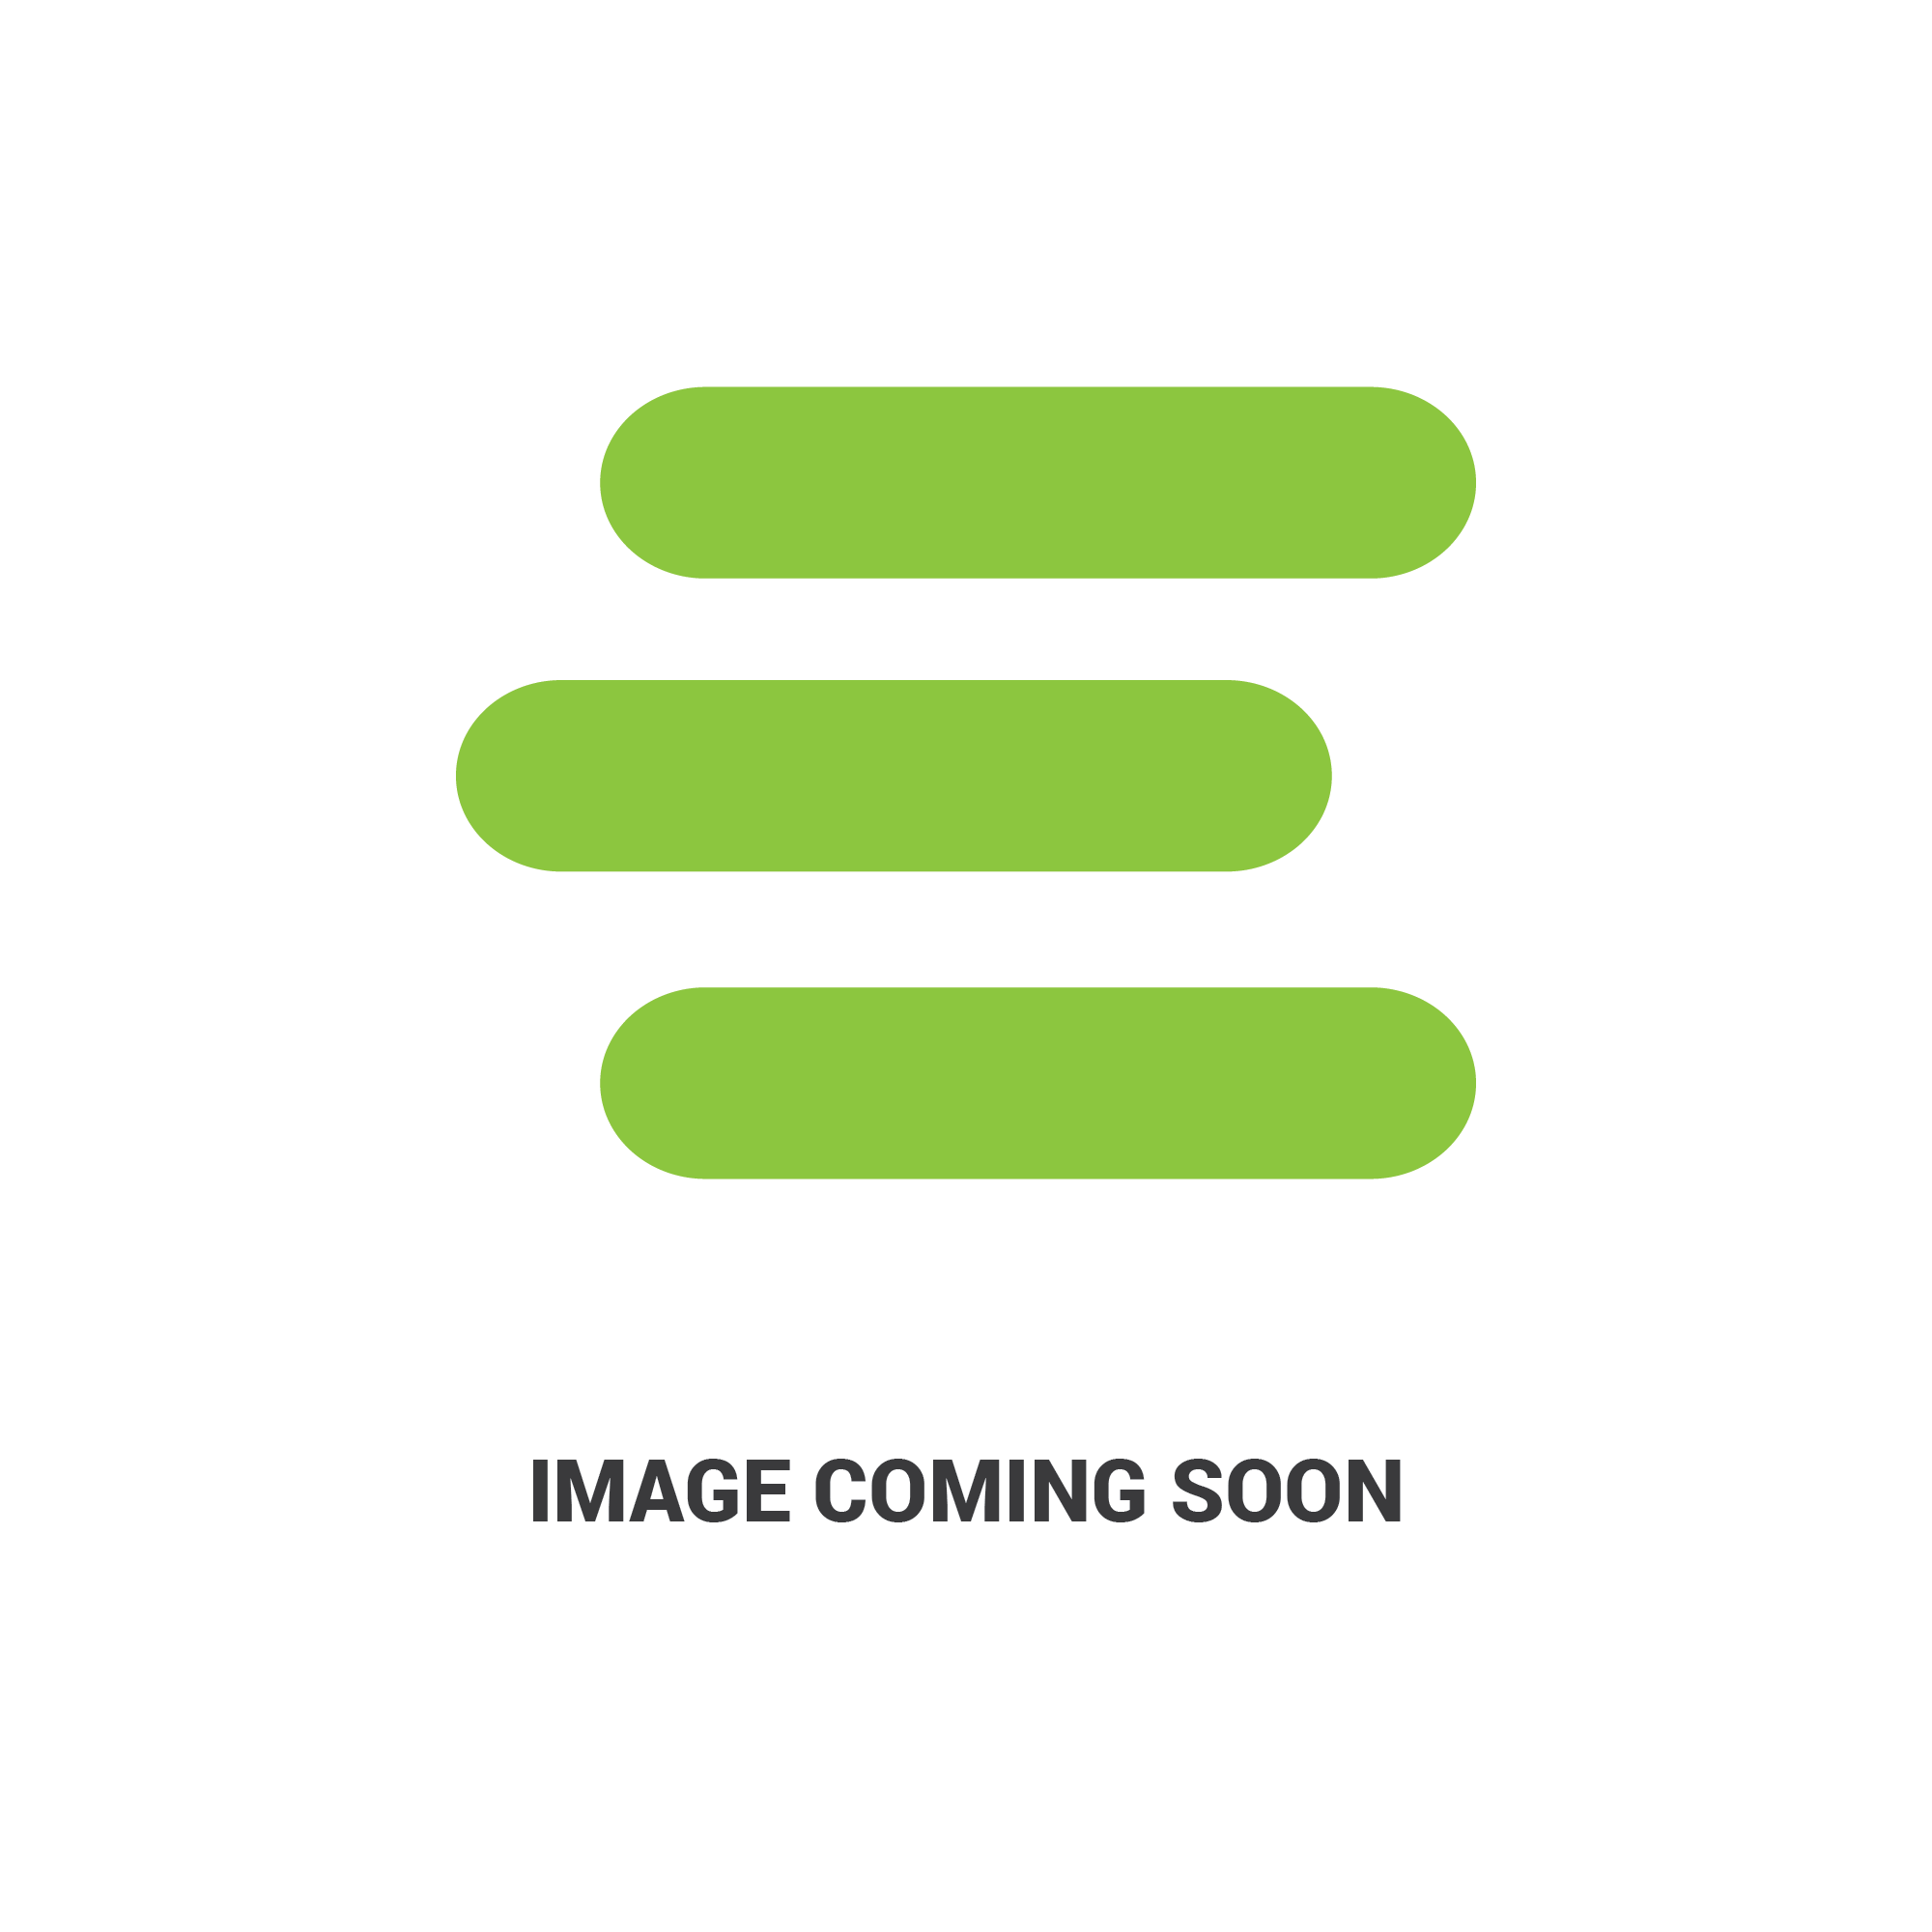 E-6C040-561232266_1 .jpg